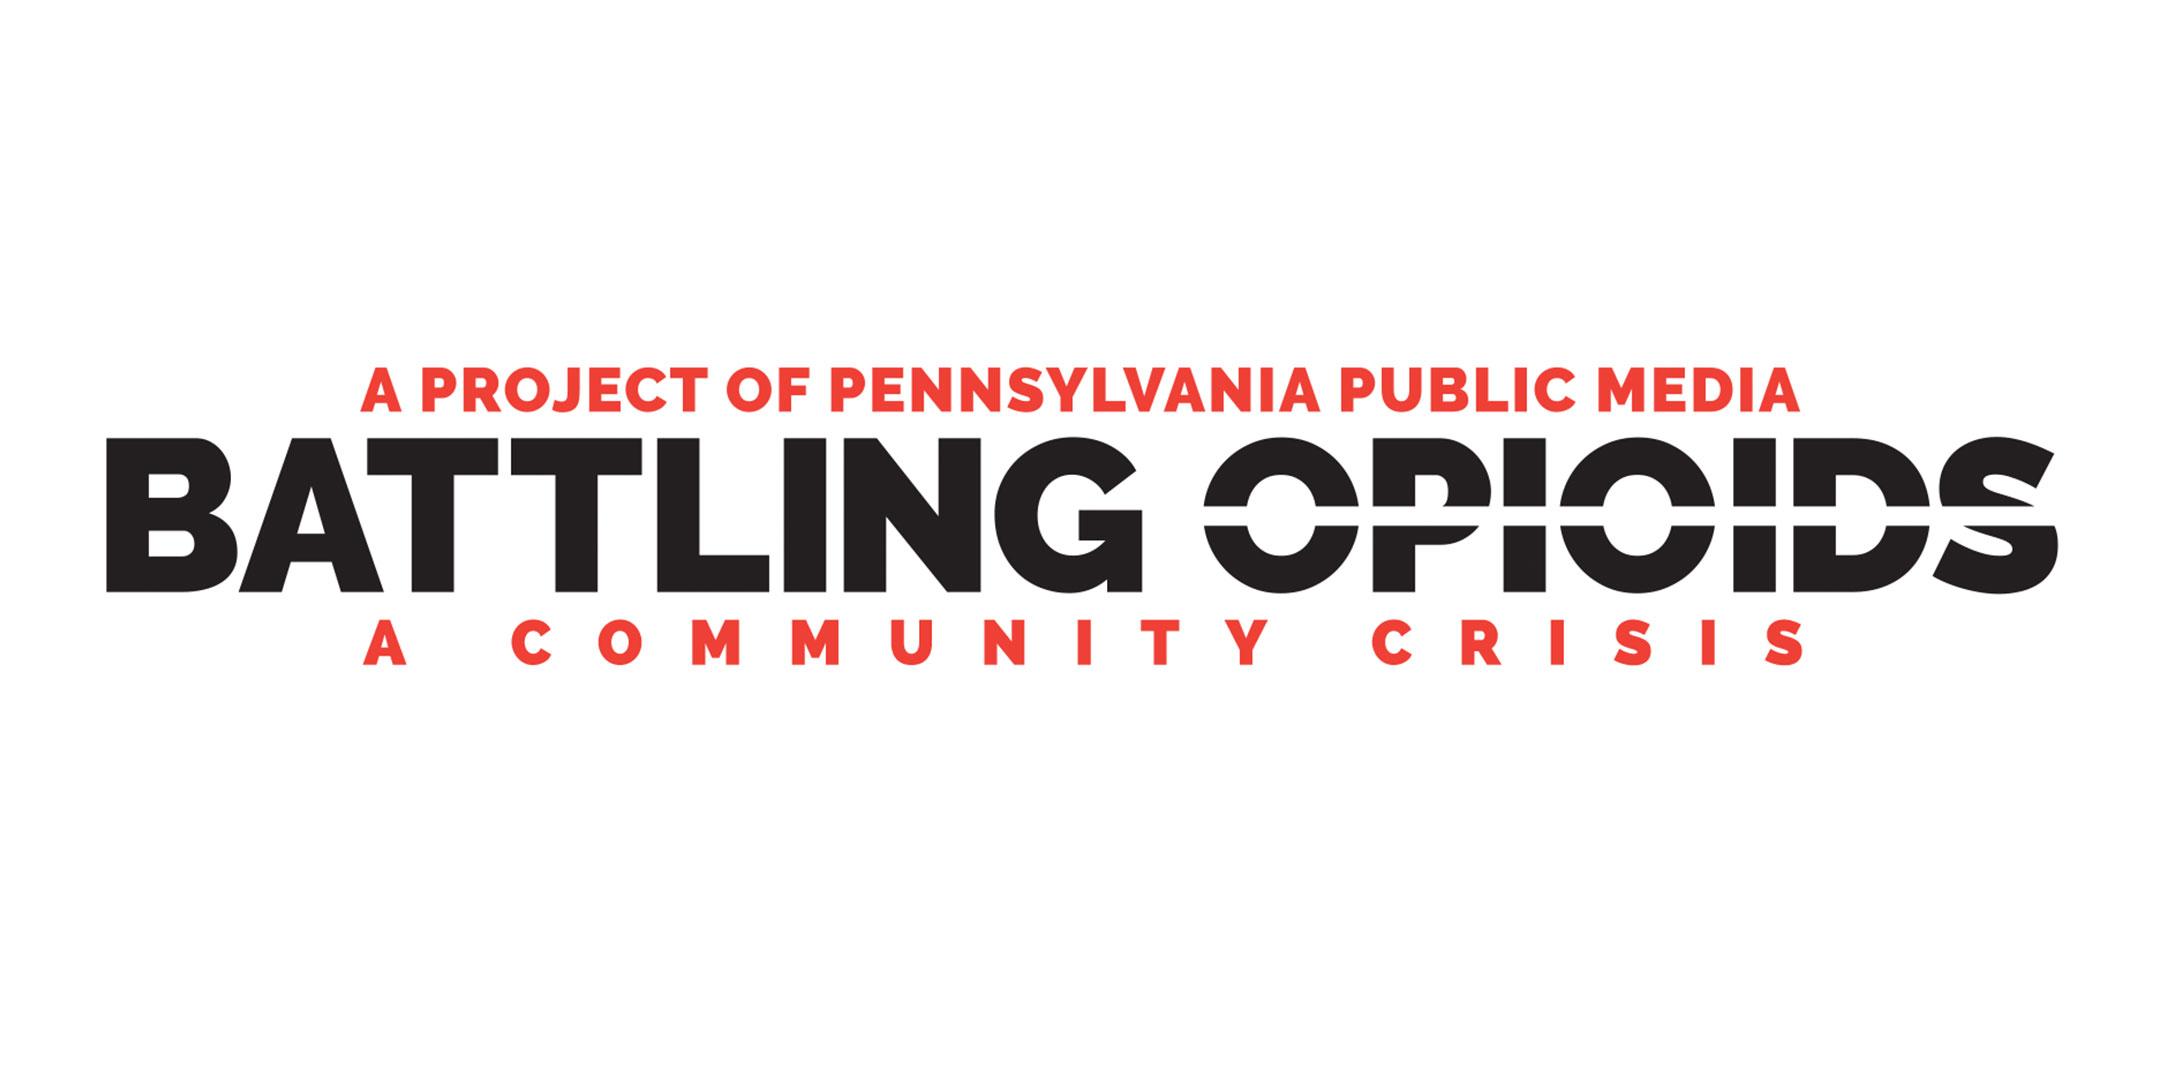 Battling Opioids: A Community Crisis